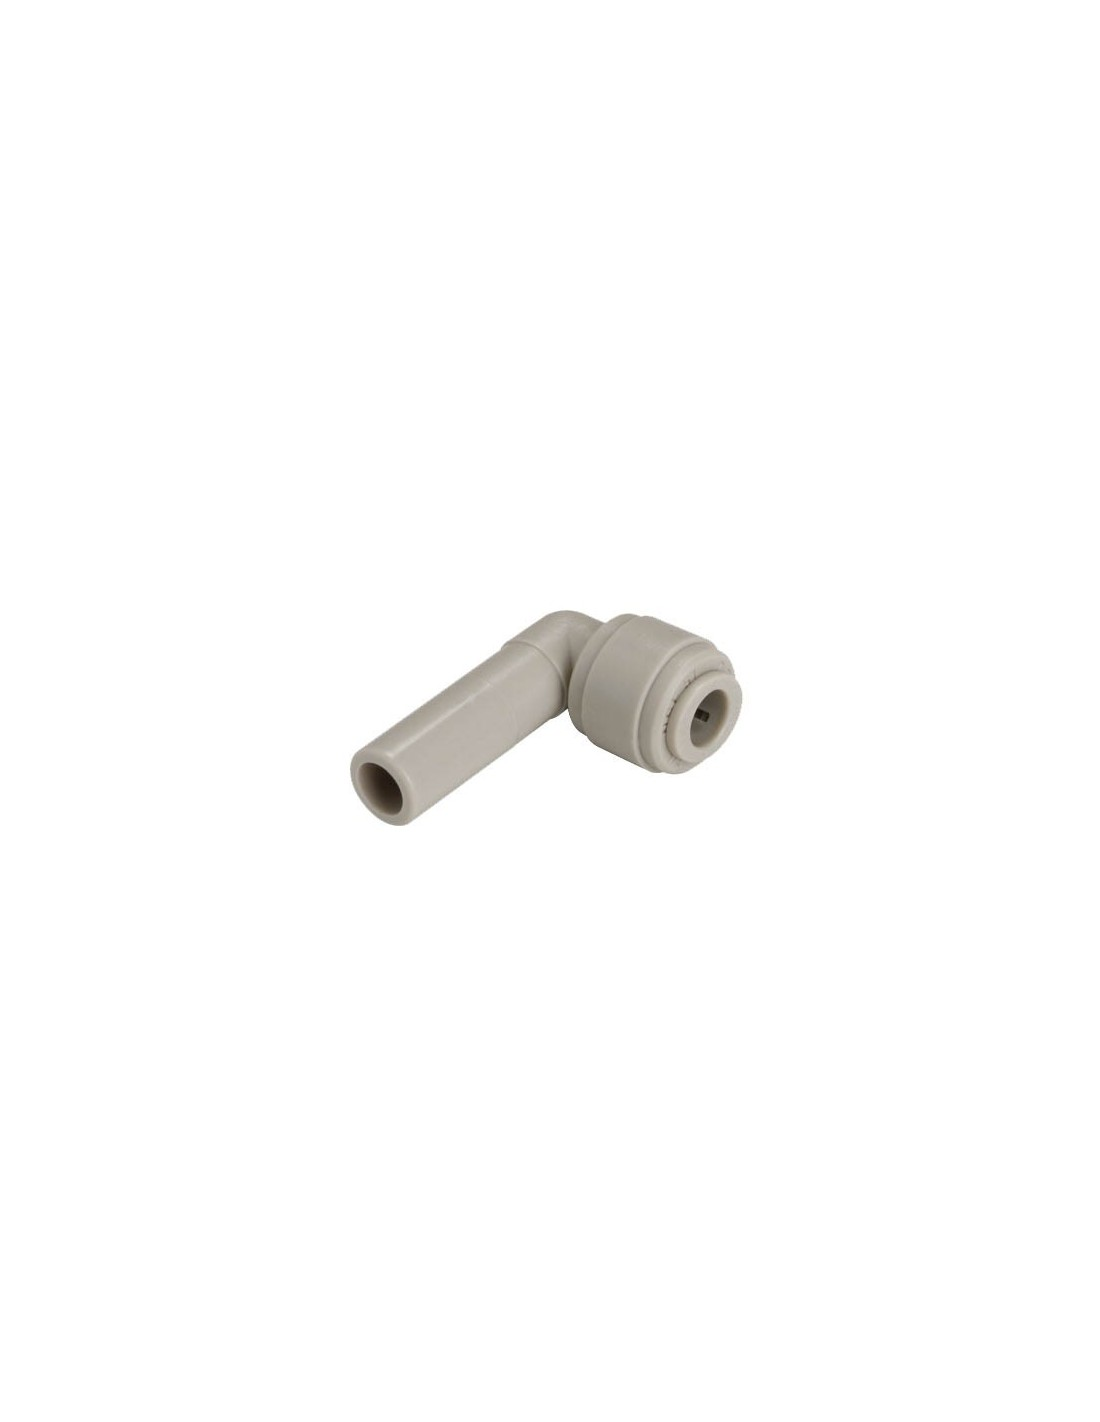 HLJ-I - FluidFit HLJ Union elbow tube with stem (inch)